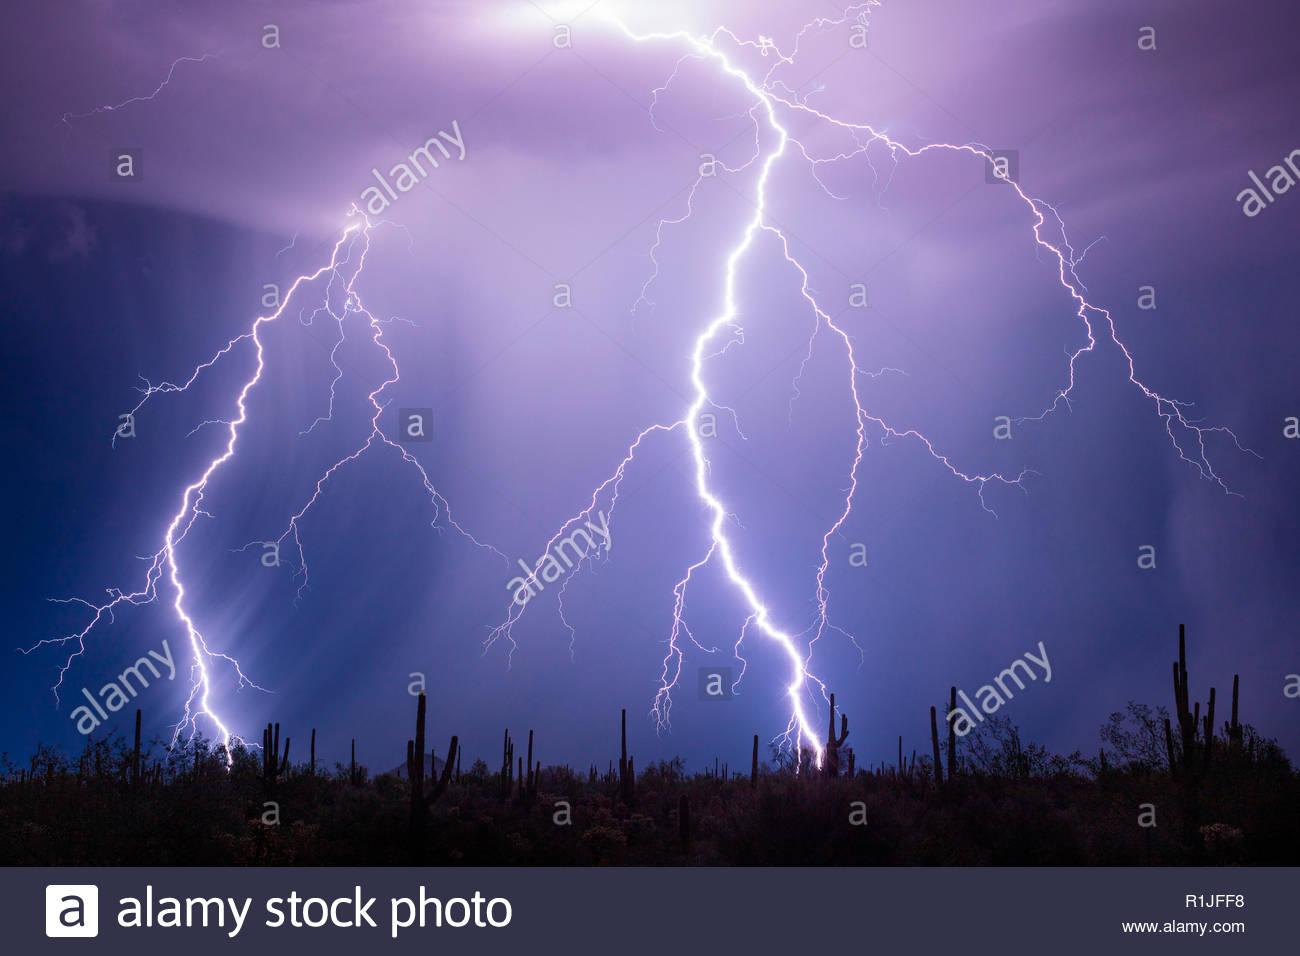 Stoic saguaro cactus (Carnegiea gigantea) watch as lightning blasts the landscape around them, Park Link Road, Arizona, USA on August 11th 2018 - Stock Image